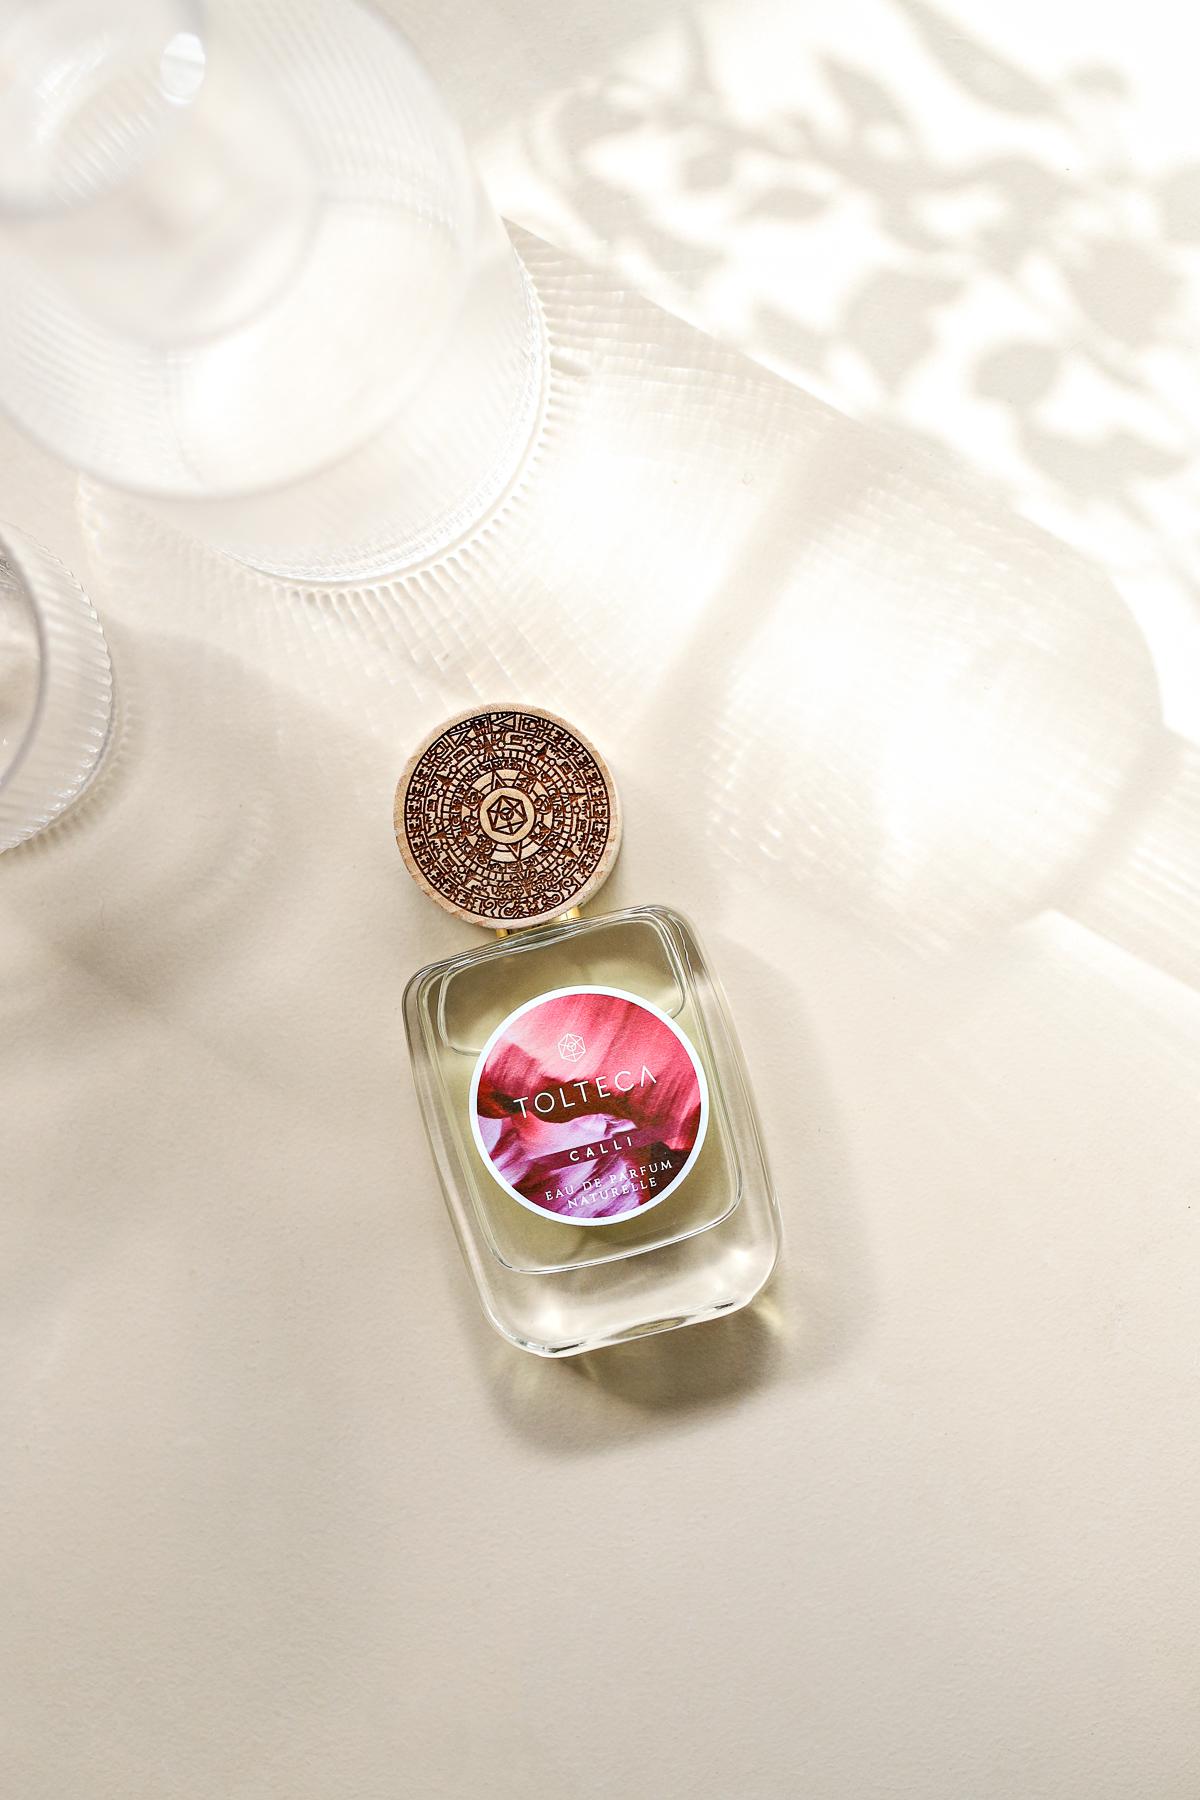 Tolteca Calli eau de parfum